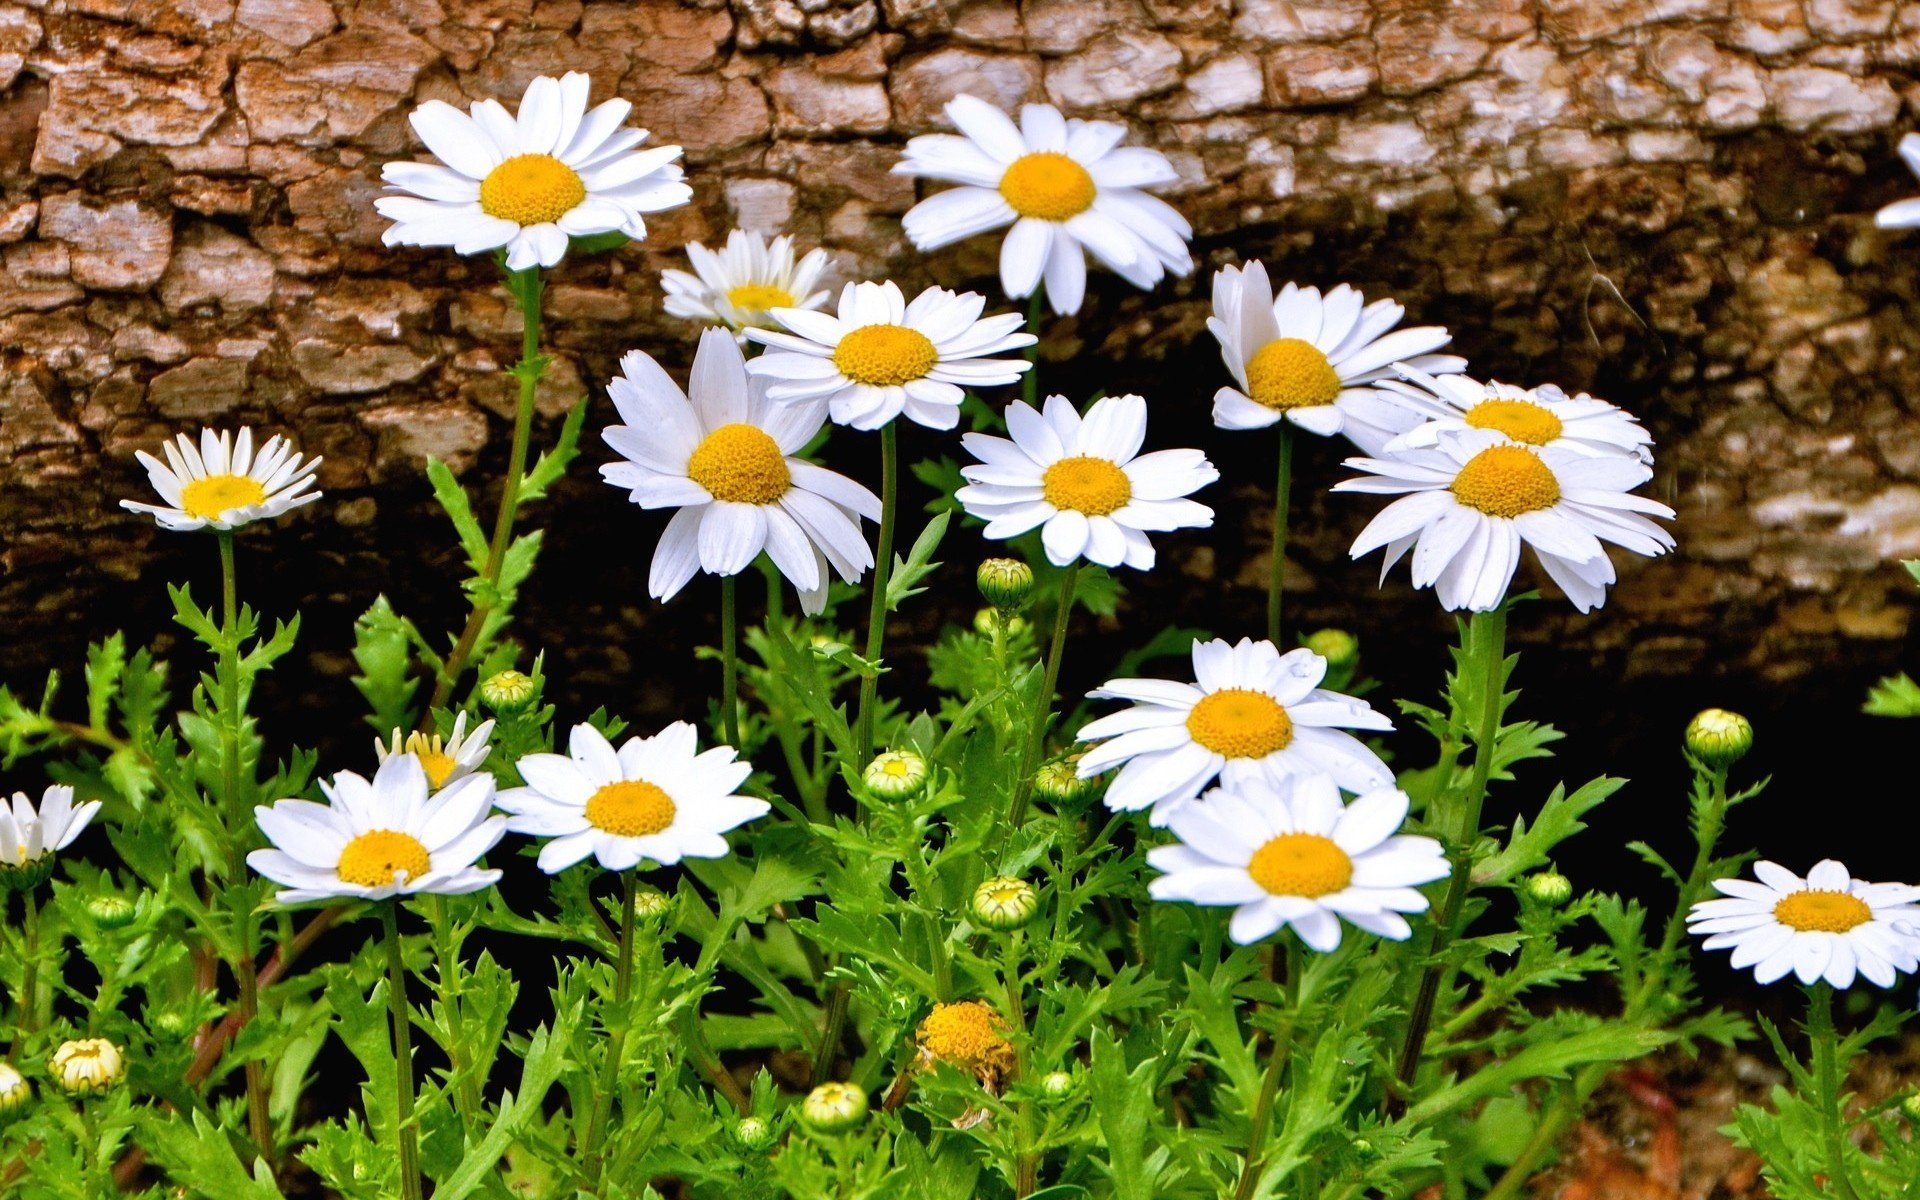 Daisies Daisy Flowers Flowers Wallpaper 1920x1200 281652